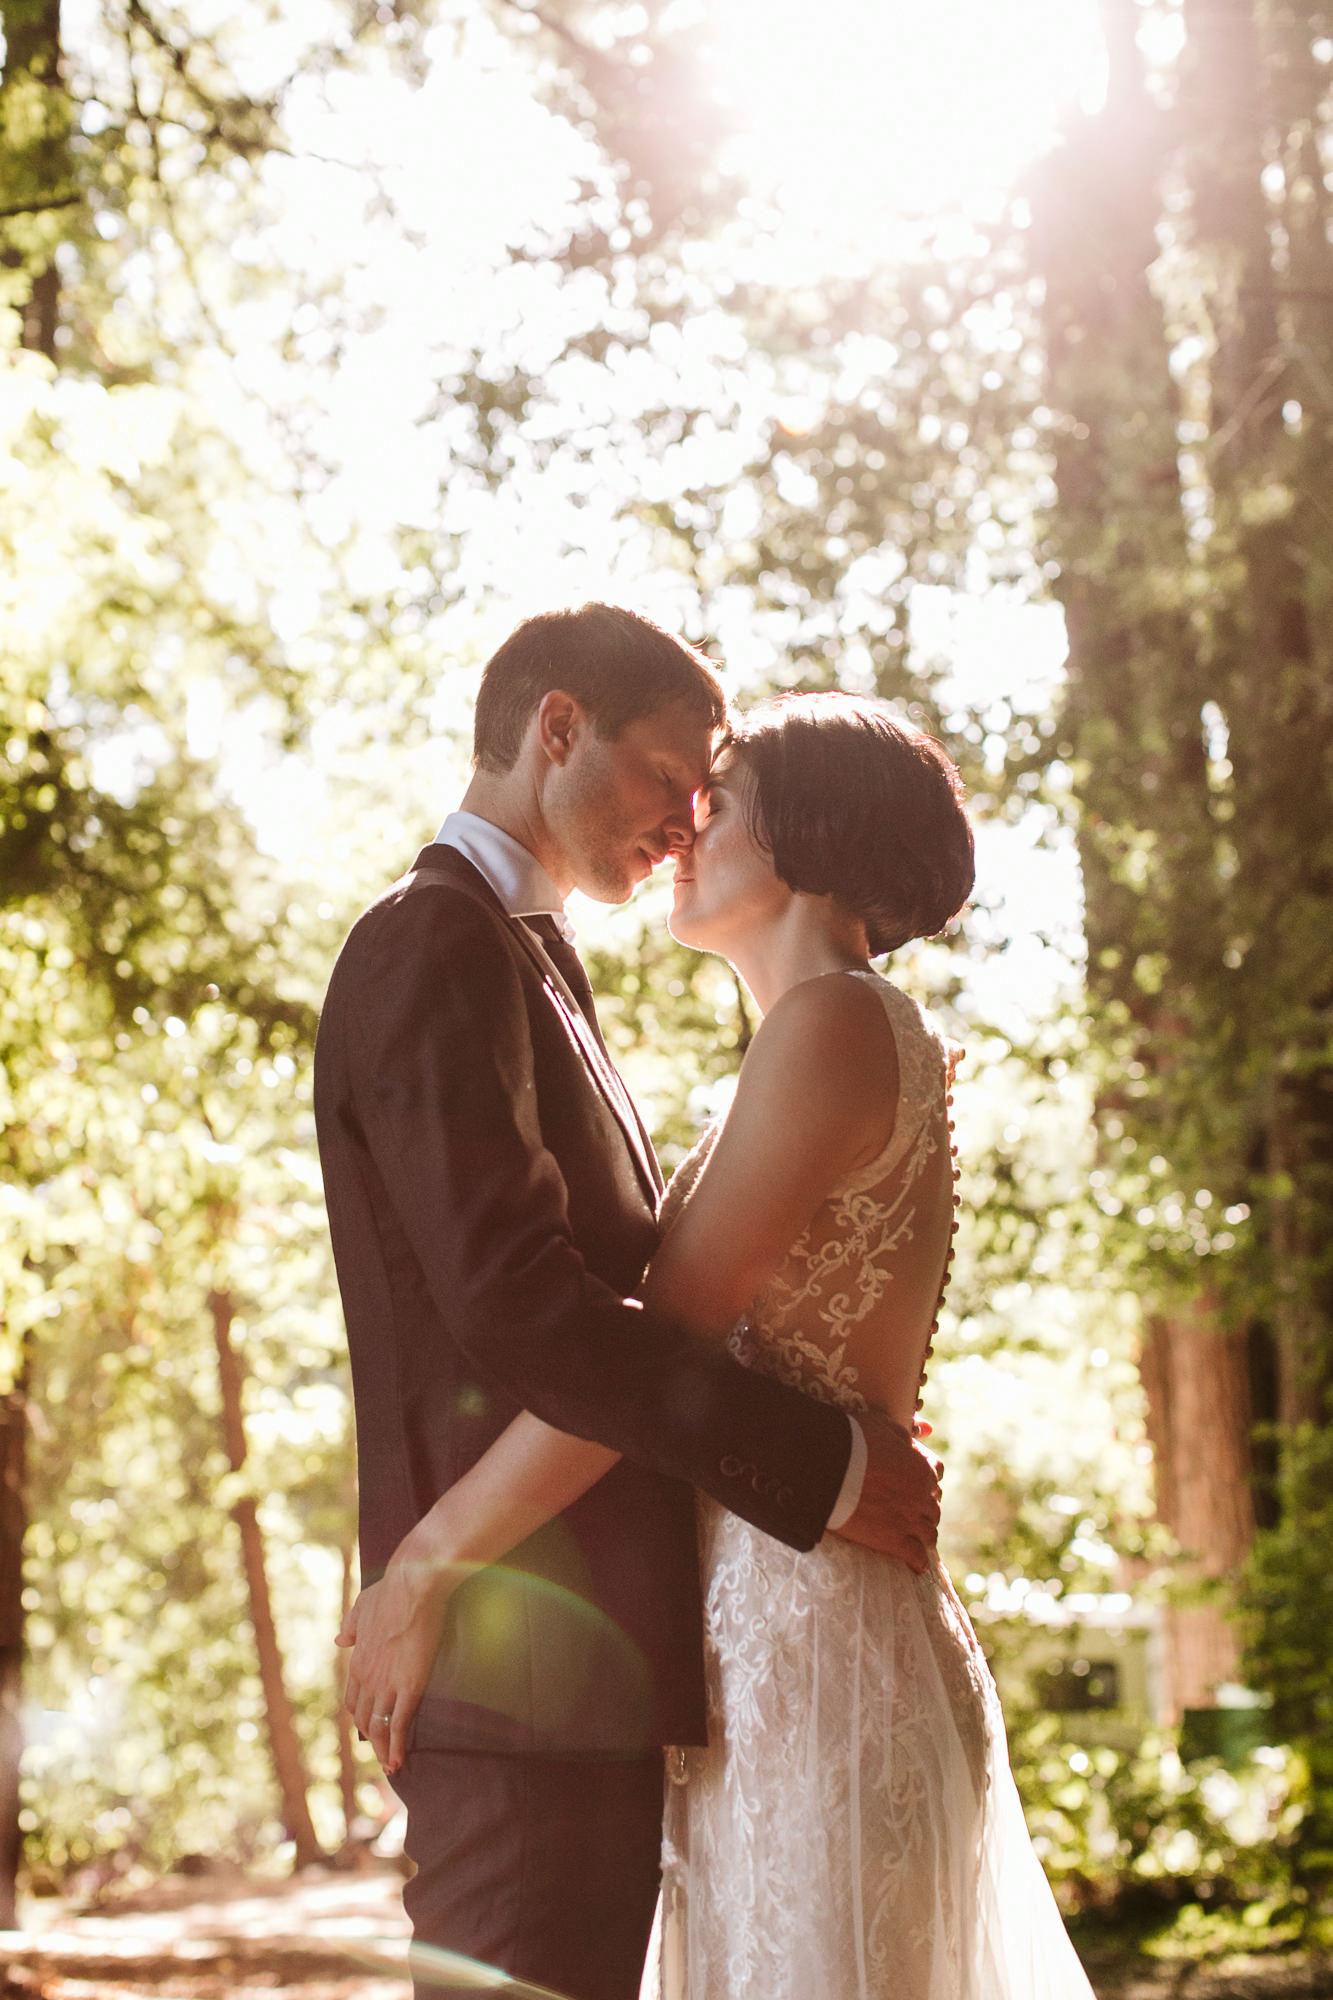 California-wedding-photographer-alfonso-flores-pamplin-groove-283.jpg